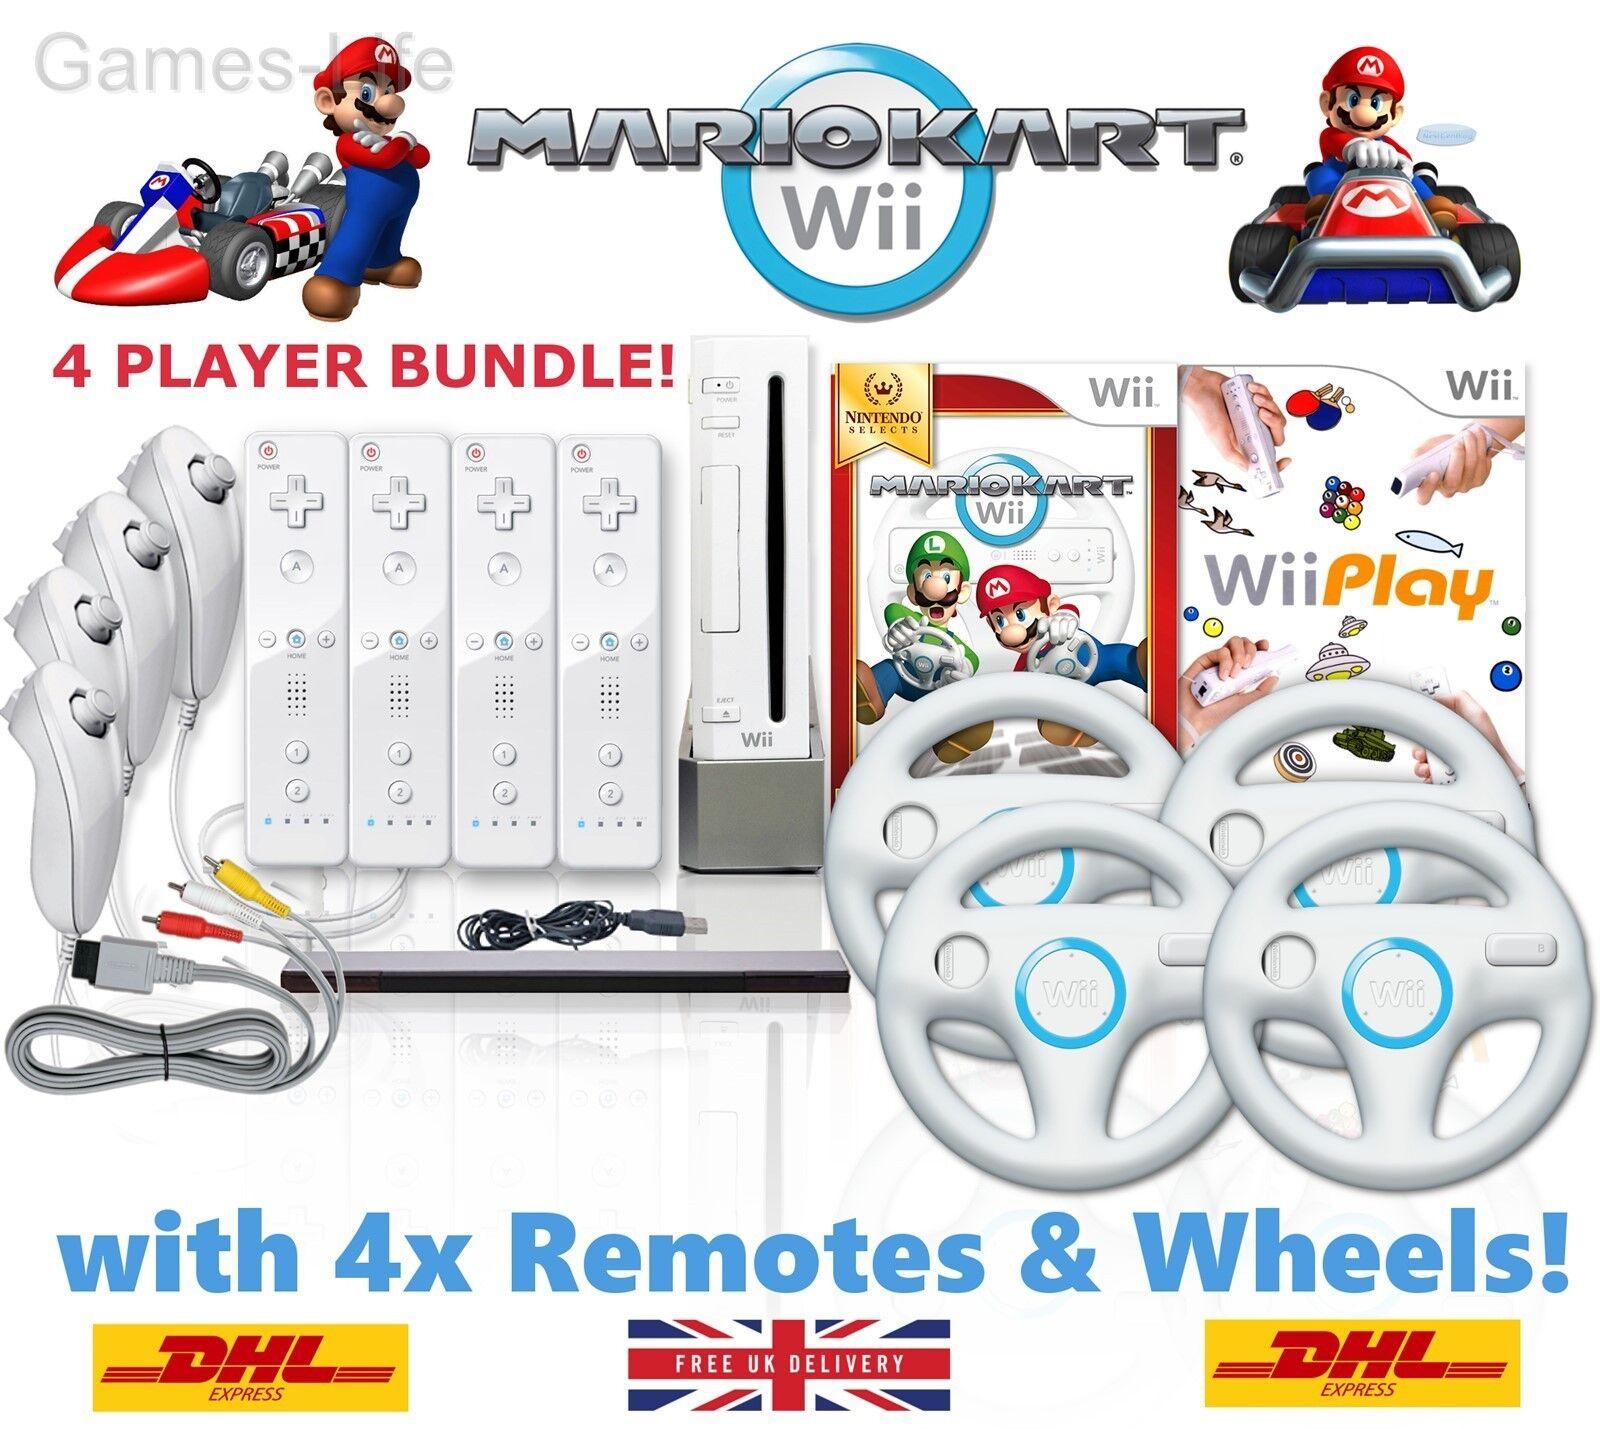 Wii console mario kart 4 player bundle 4 remotes 4 wheels - Wii console mario kart bundle ...